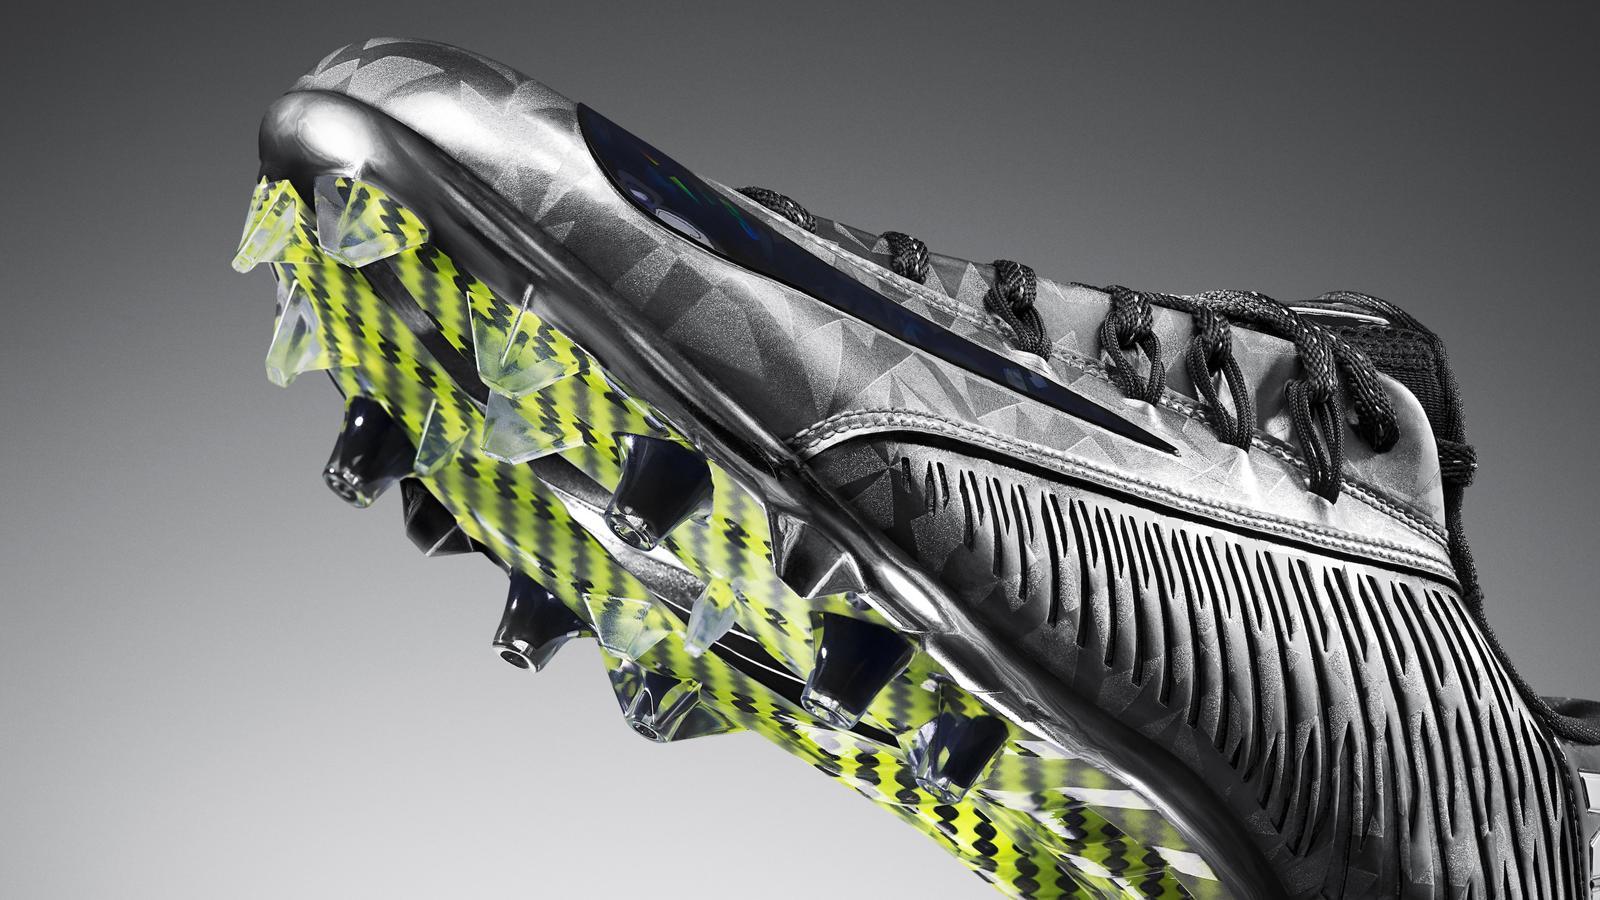 Mens Nike NFL Vapor Carbon 2.0 Elite 2014 TD Carbon Fiber Flywire Football Cleat